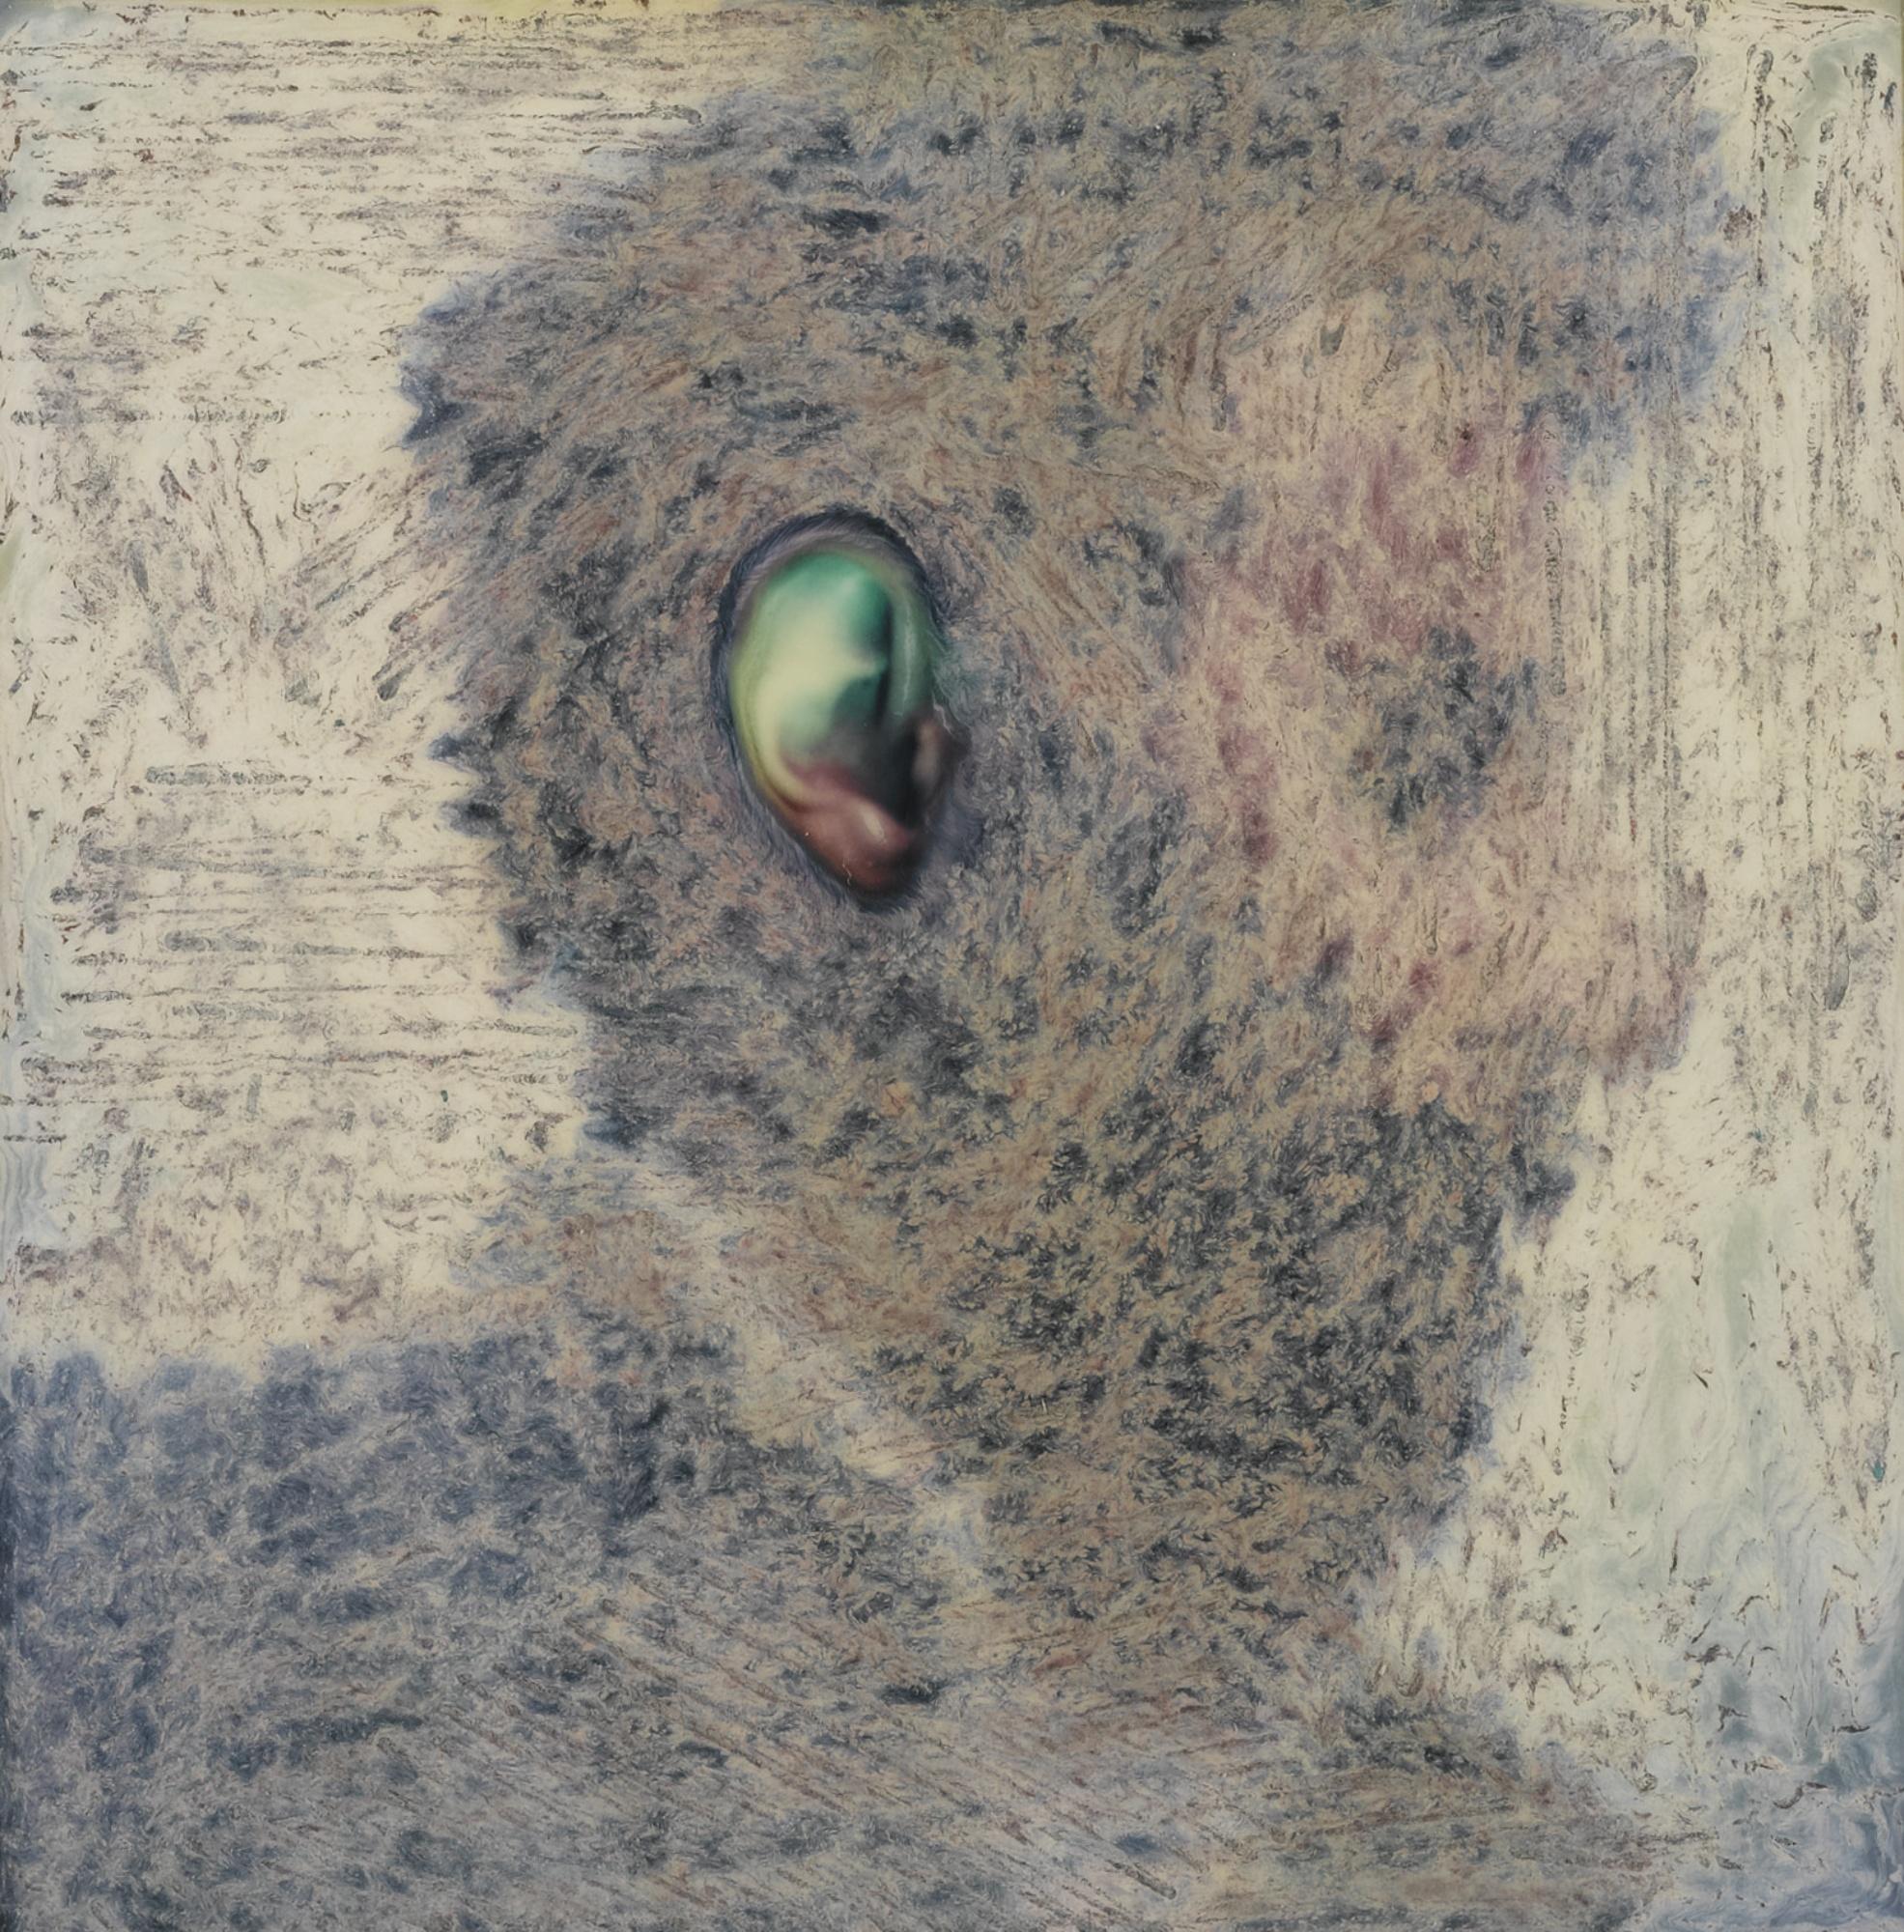 Lucas Samaras-Photo-Transformation 10/31/73 (Ear)-1973